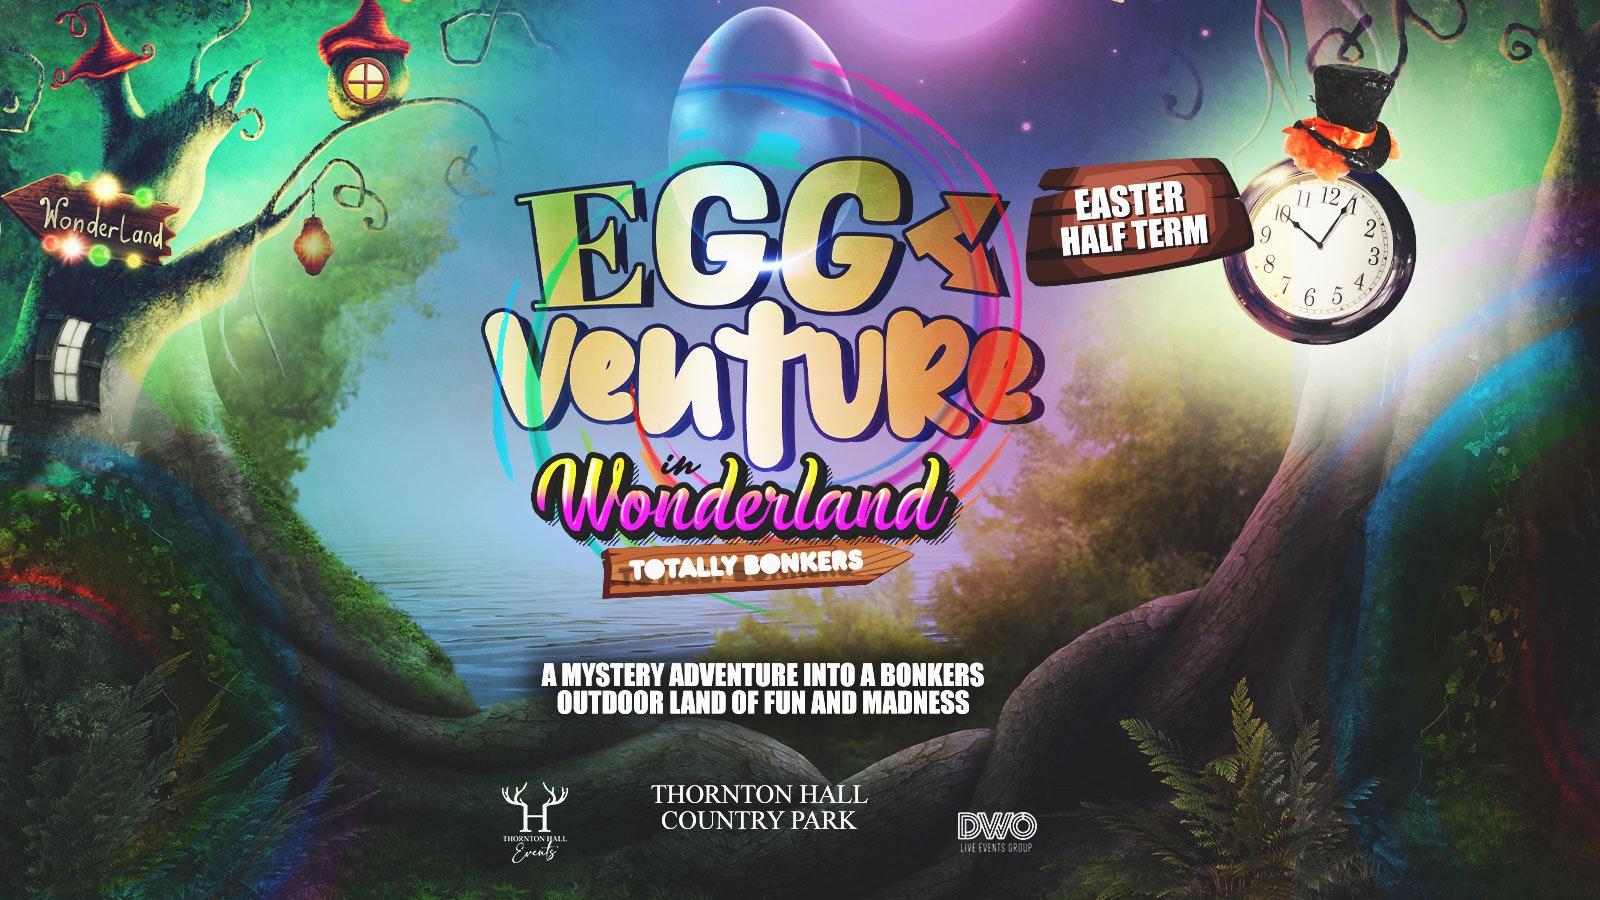 EggVenture in Wonderland – Thursday 8th April – 1pm